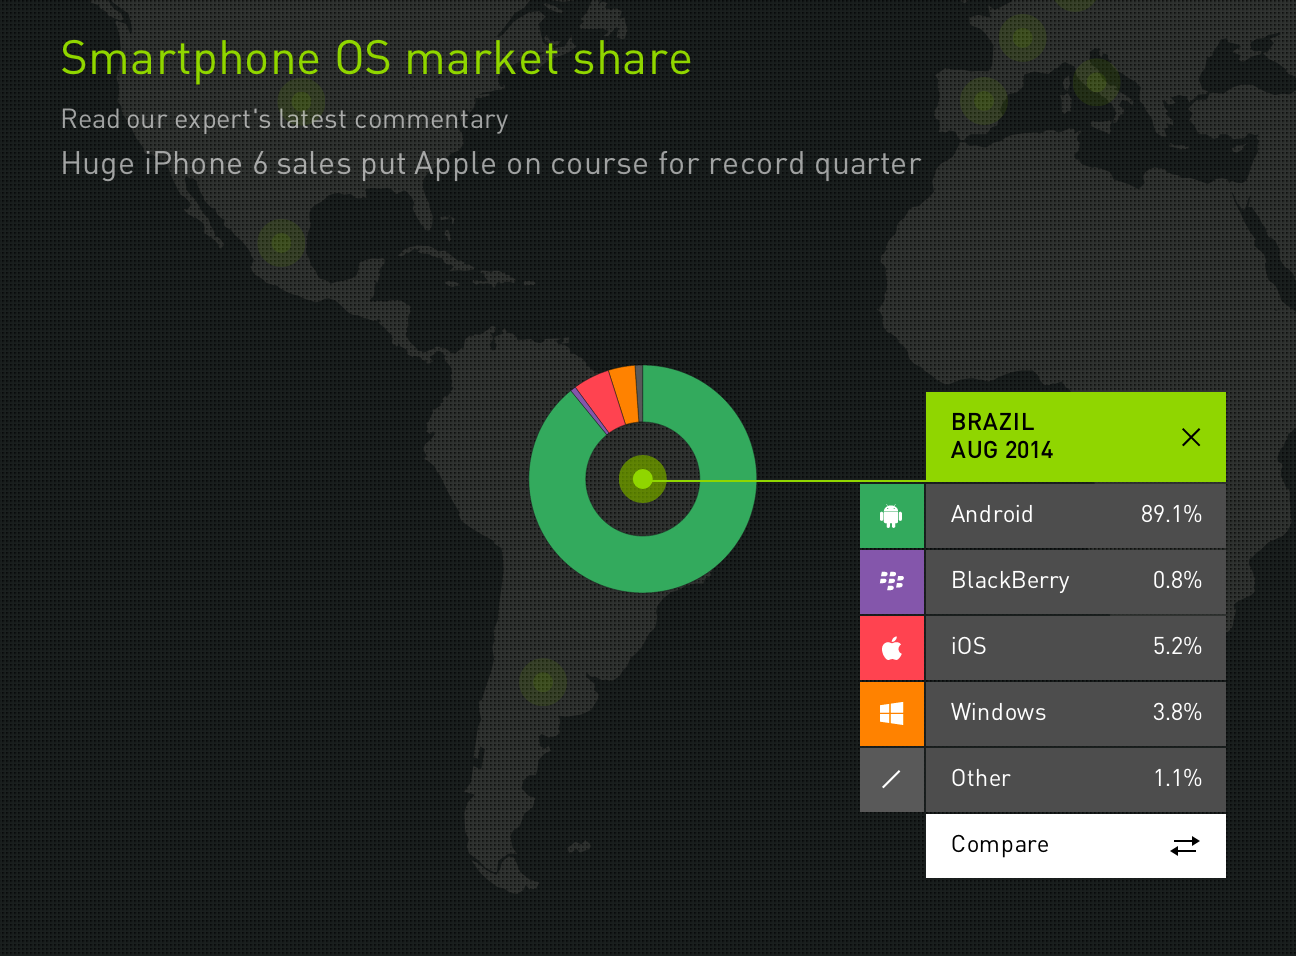 Smartphone OS market share in Brazil